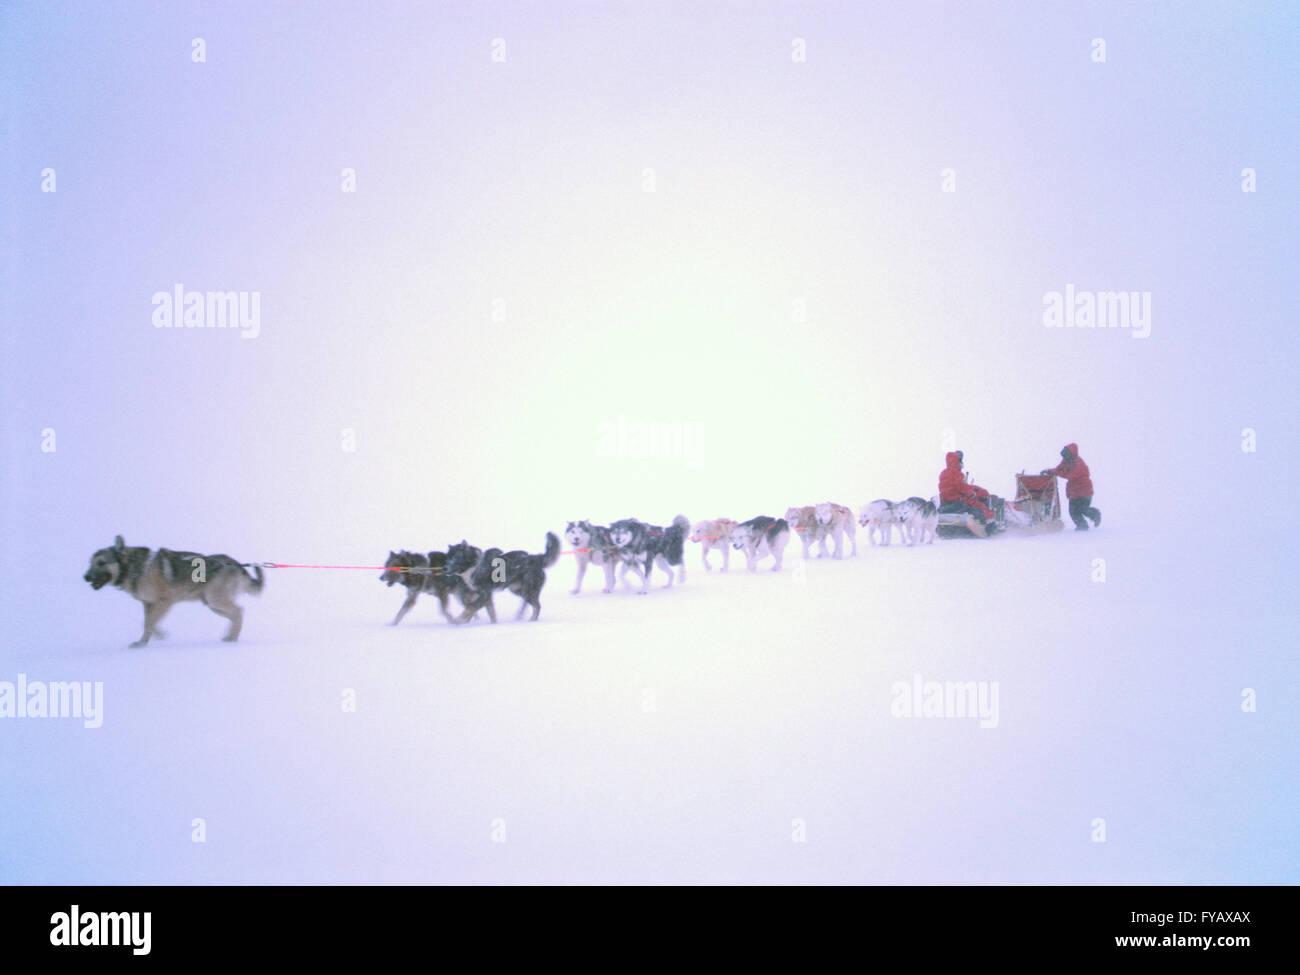 eskimo dog team stock photos u0026 eskimo dog team stock images alamy